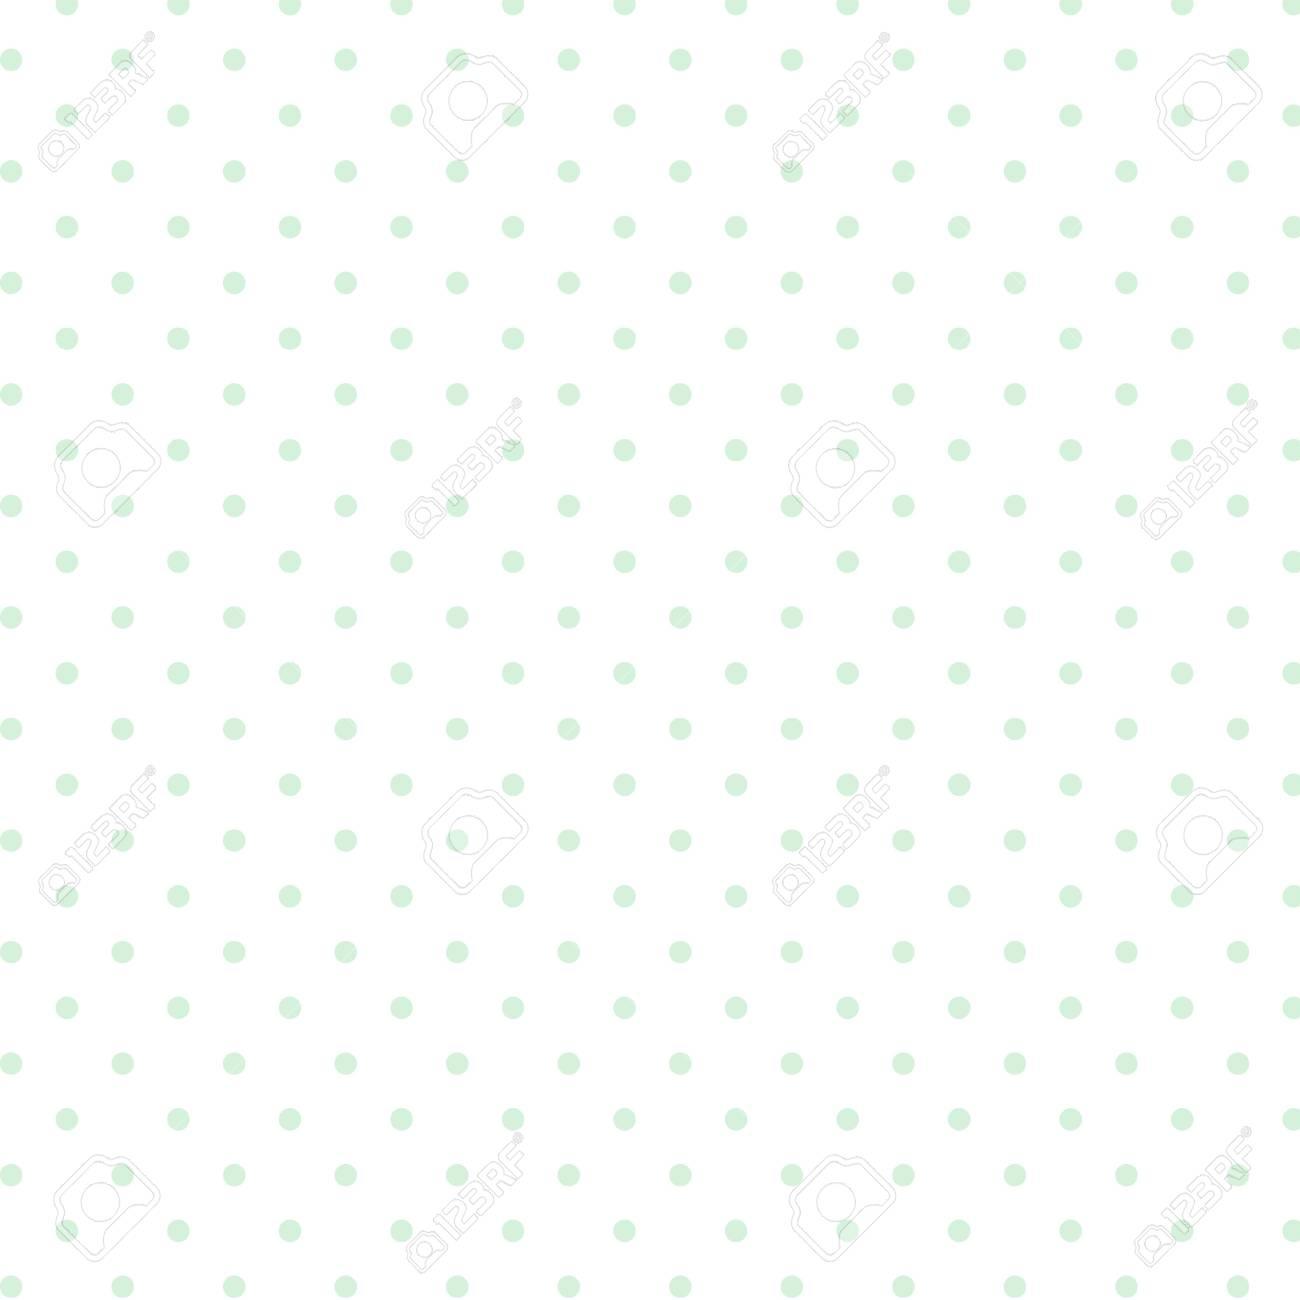 Polka dot background pattern - 114708488